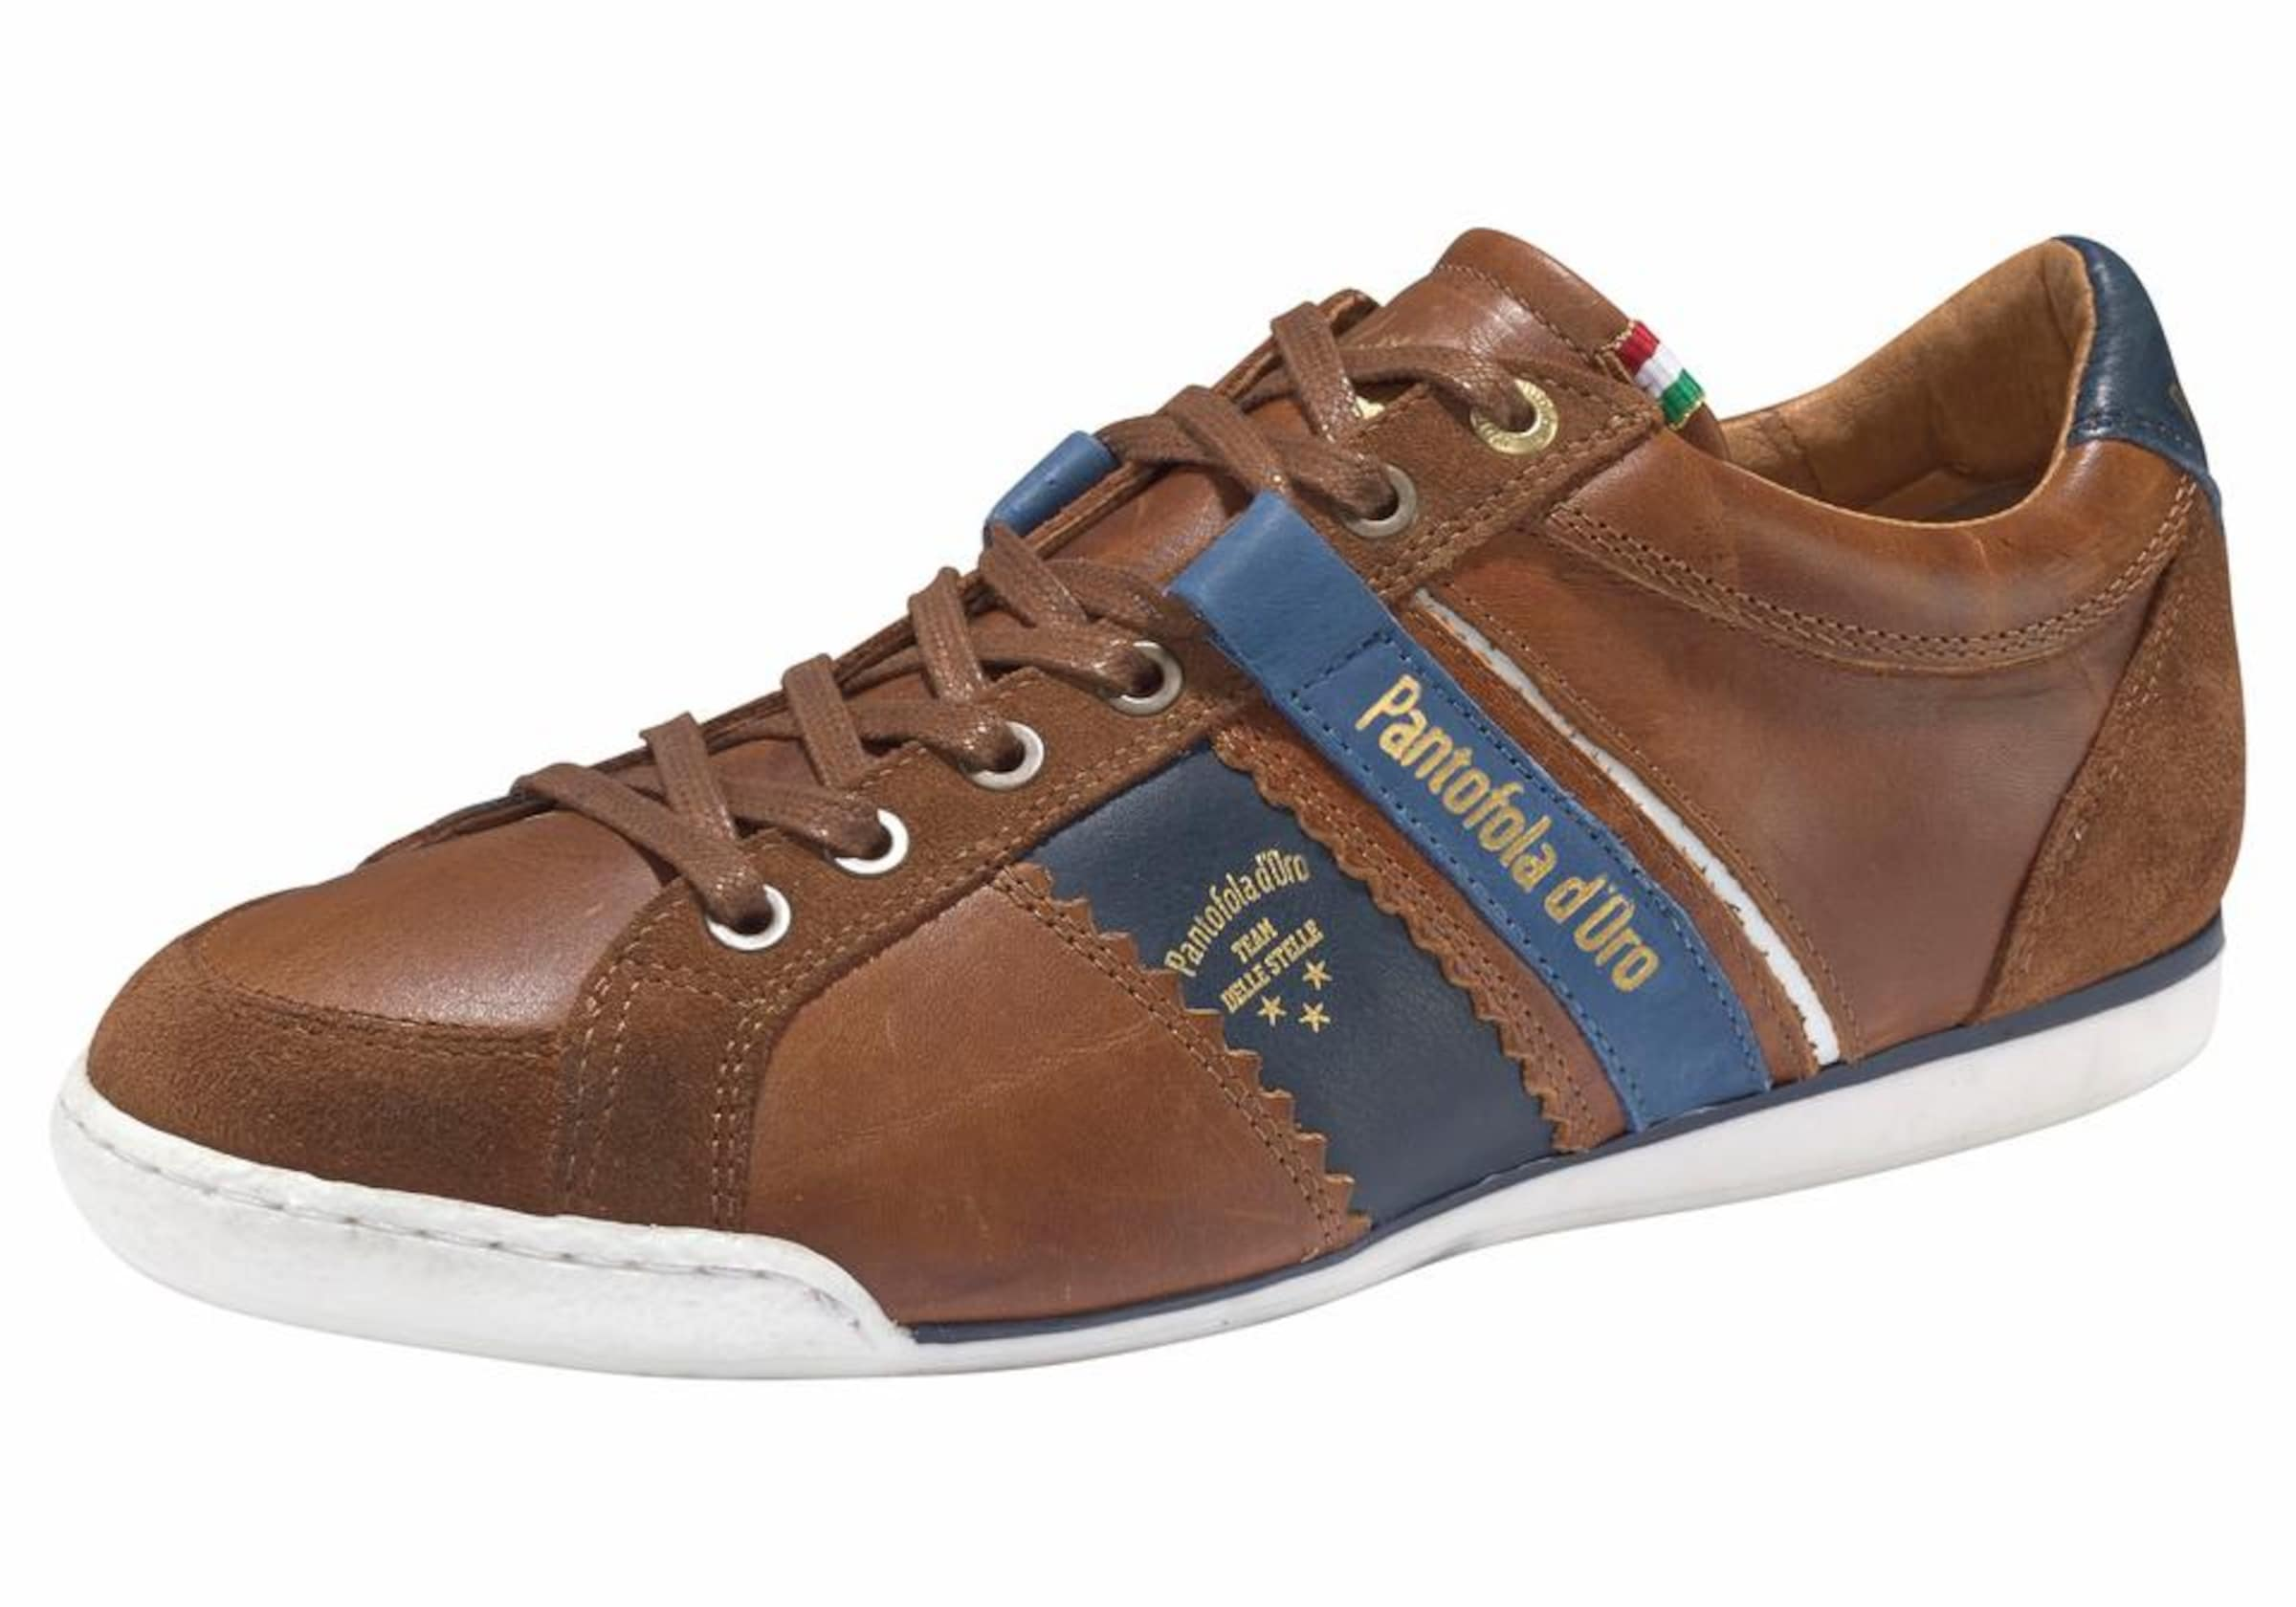 PANTOFOLA D'ORO | | D'ORO 'Savio Romagna Uomo' Schuhe Gut getragene Schuhe 224636